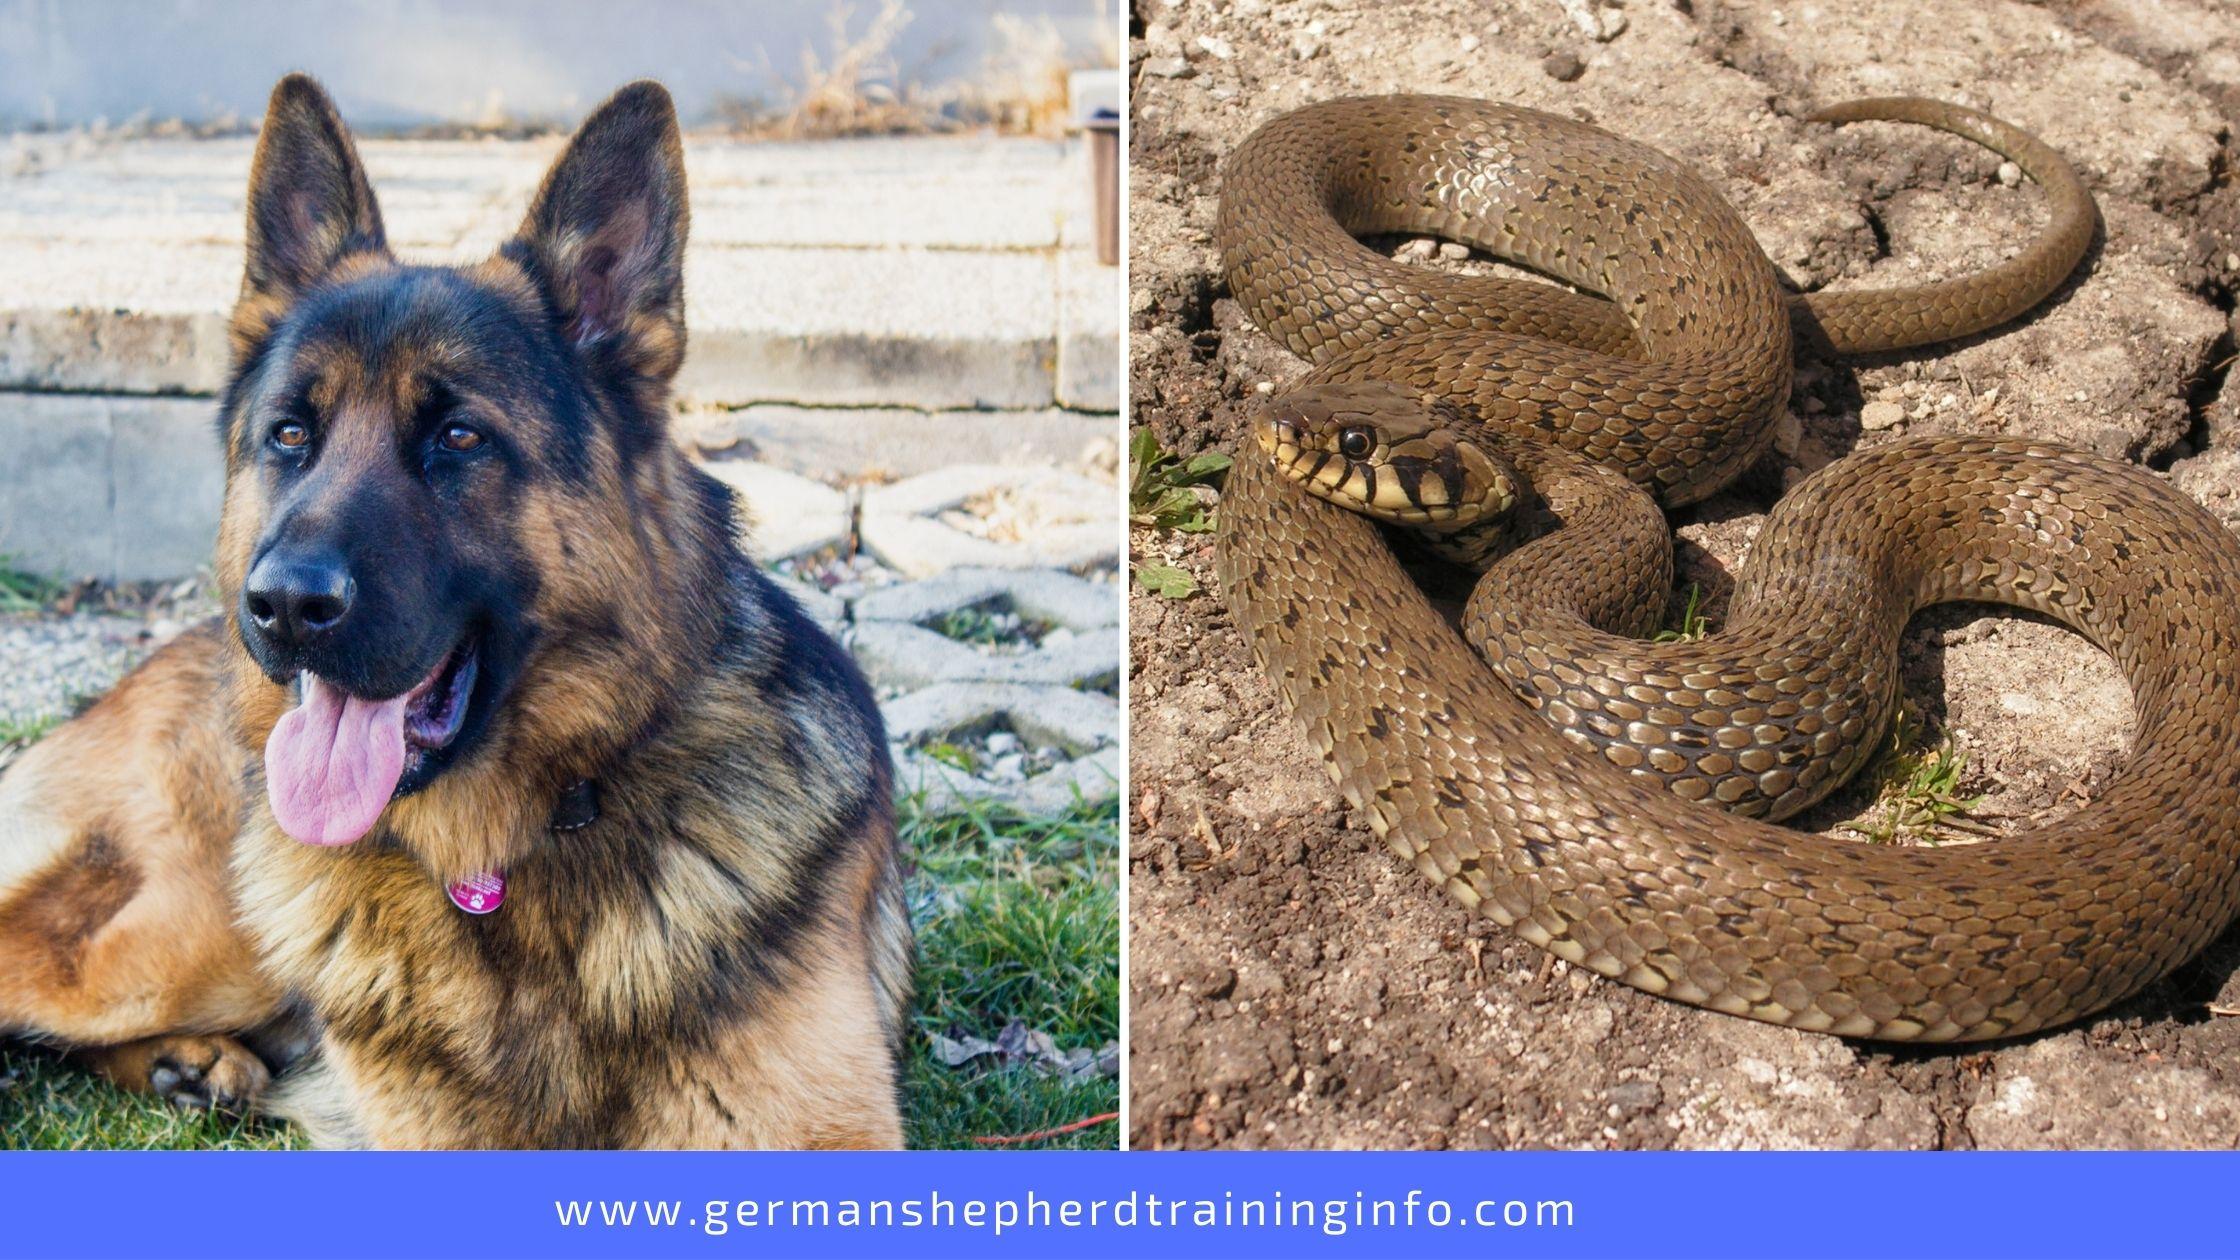 Can German Shepherds Kill Snakes?